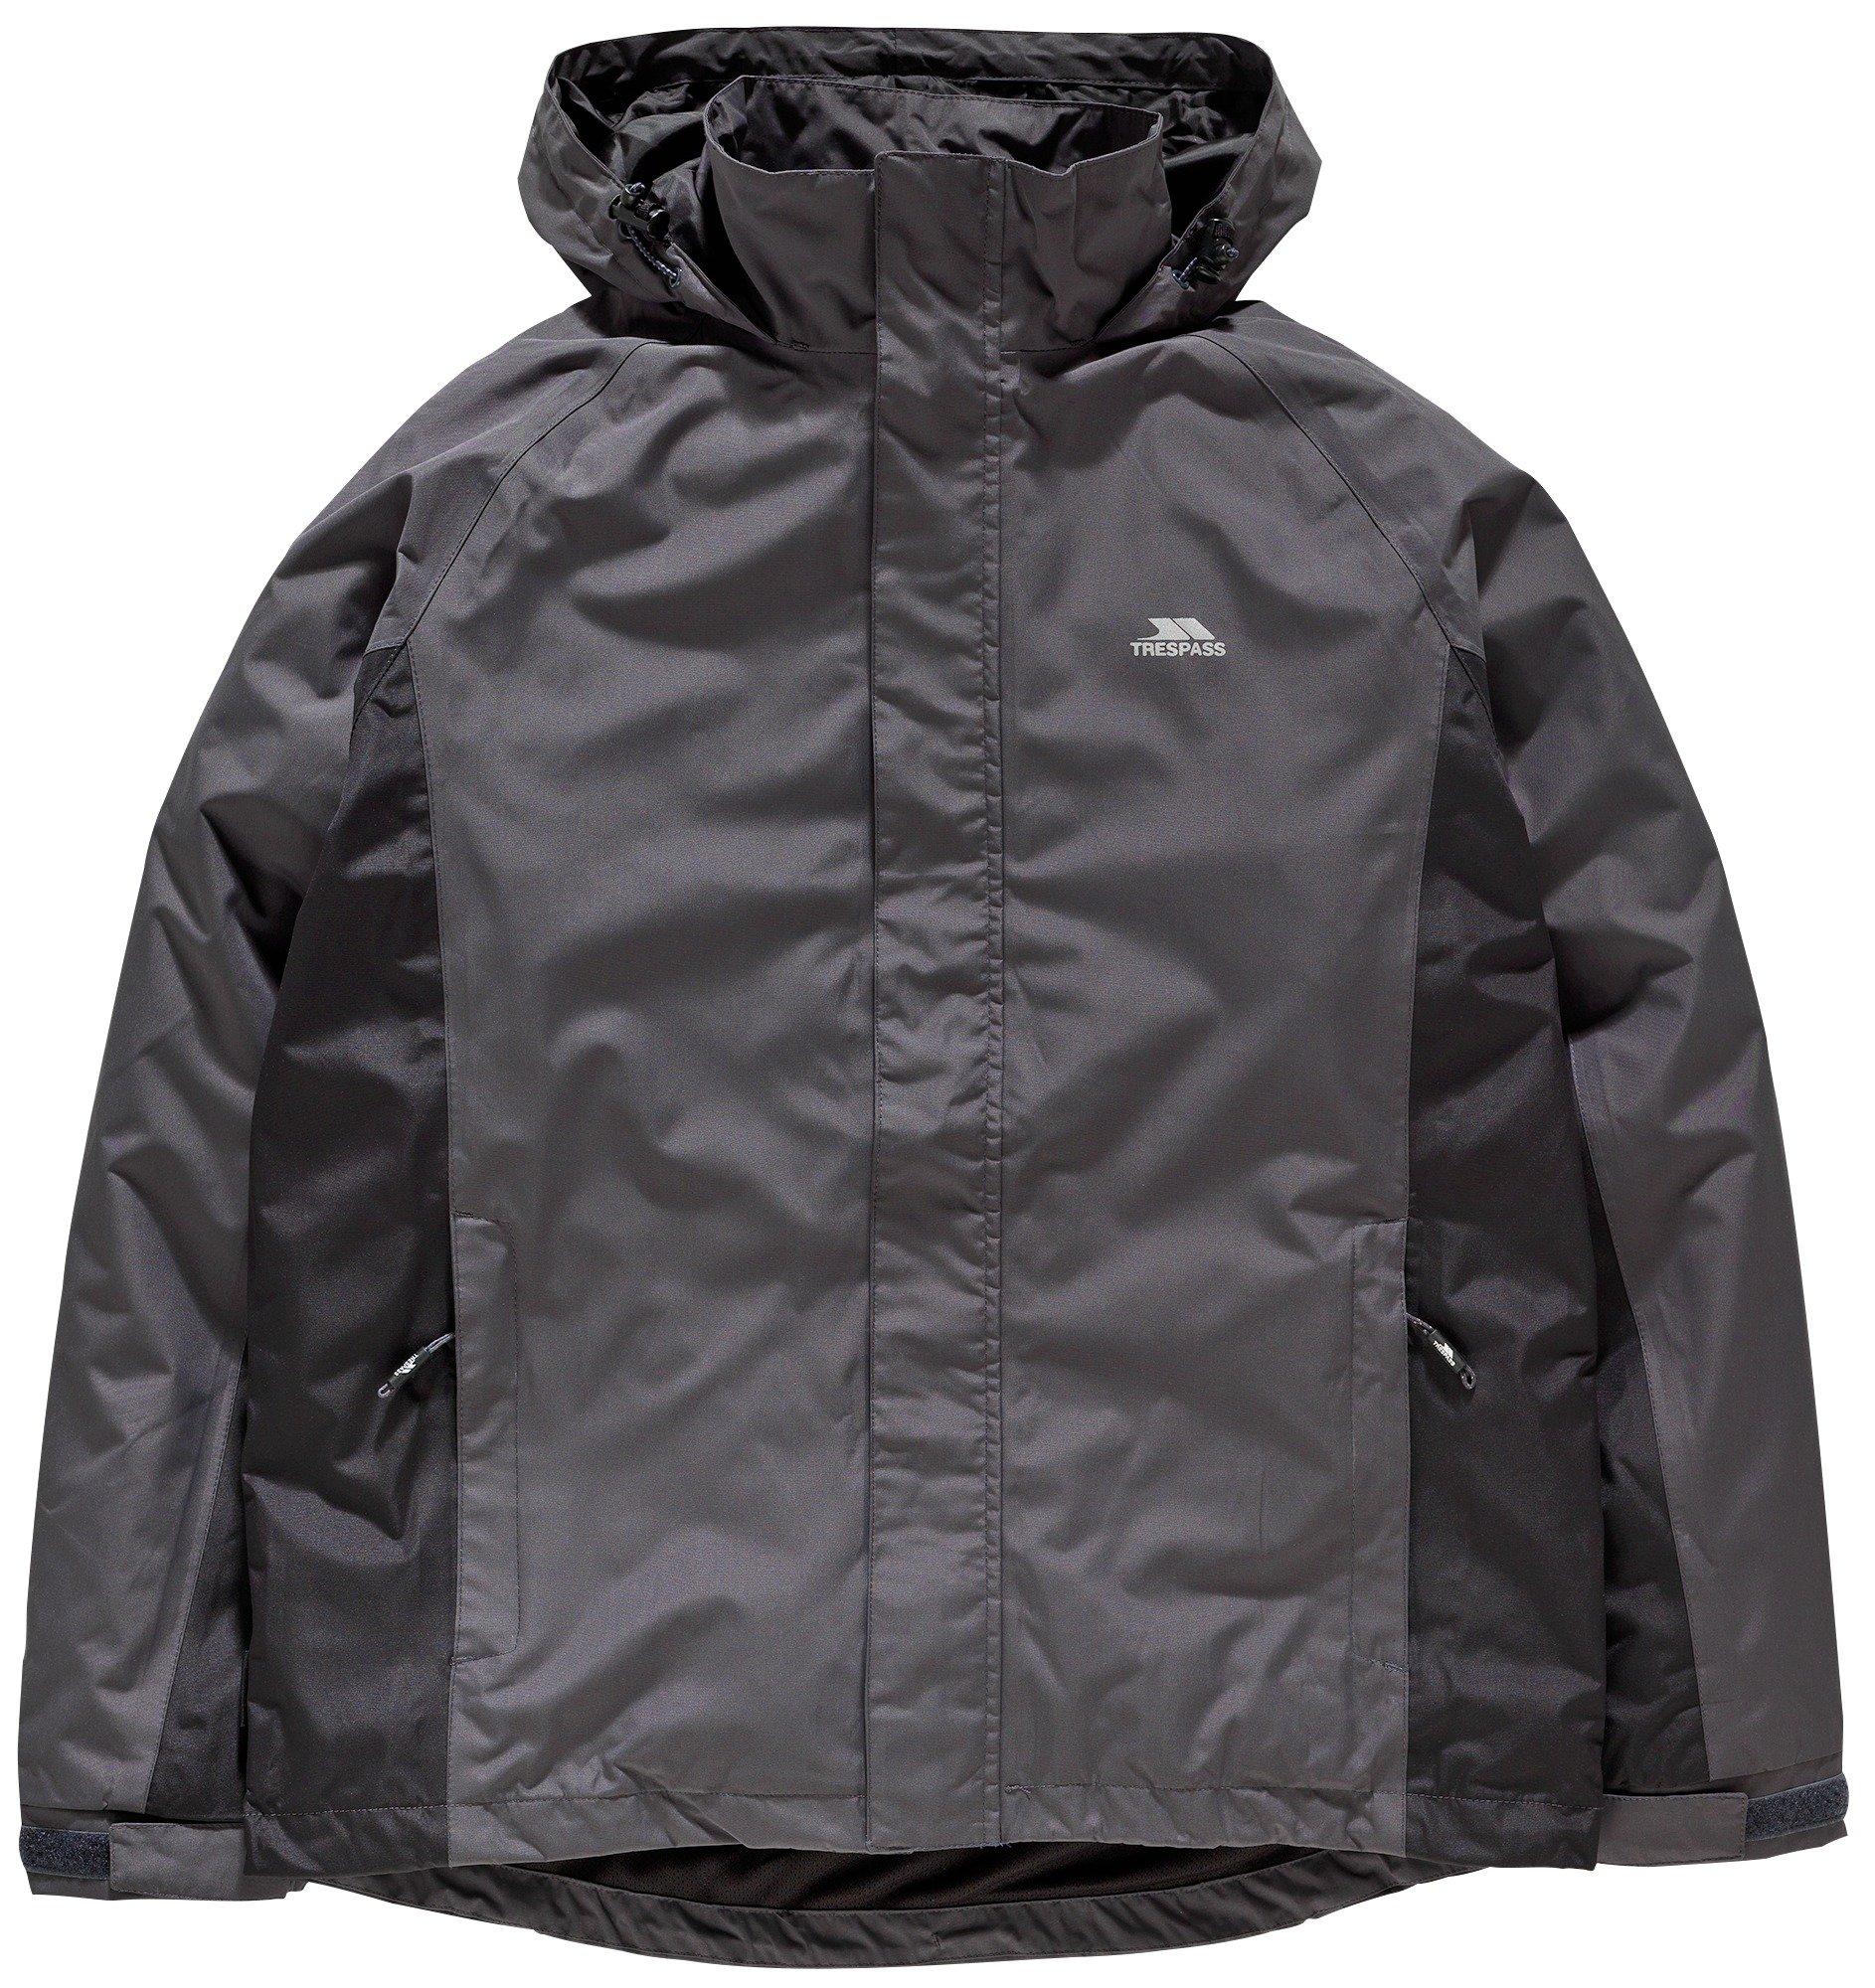 Image of Trespass Grey Rogan II Jacket - Large